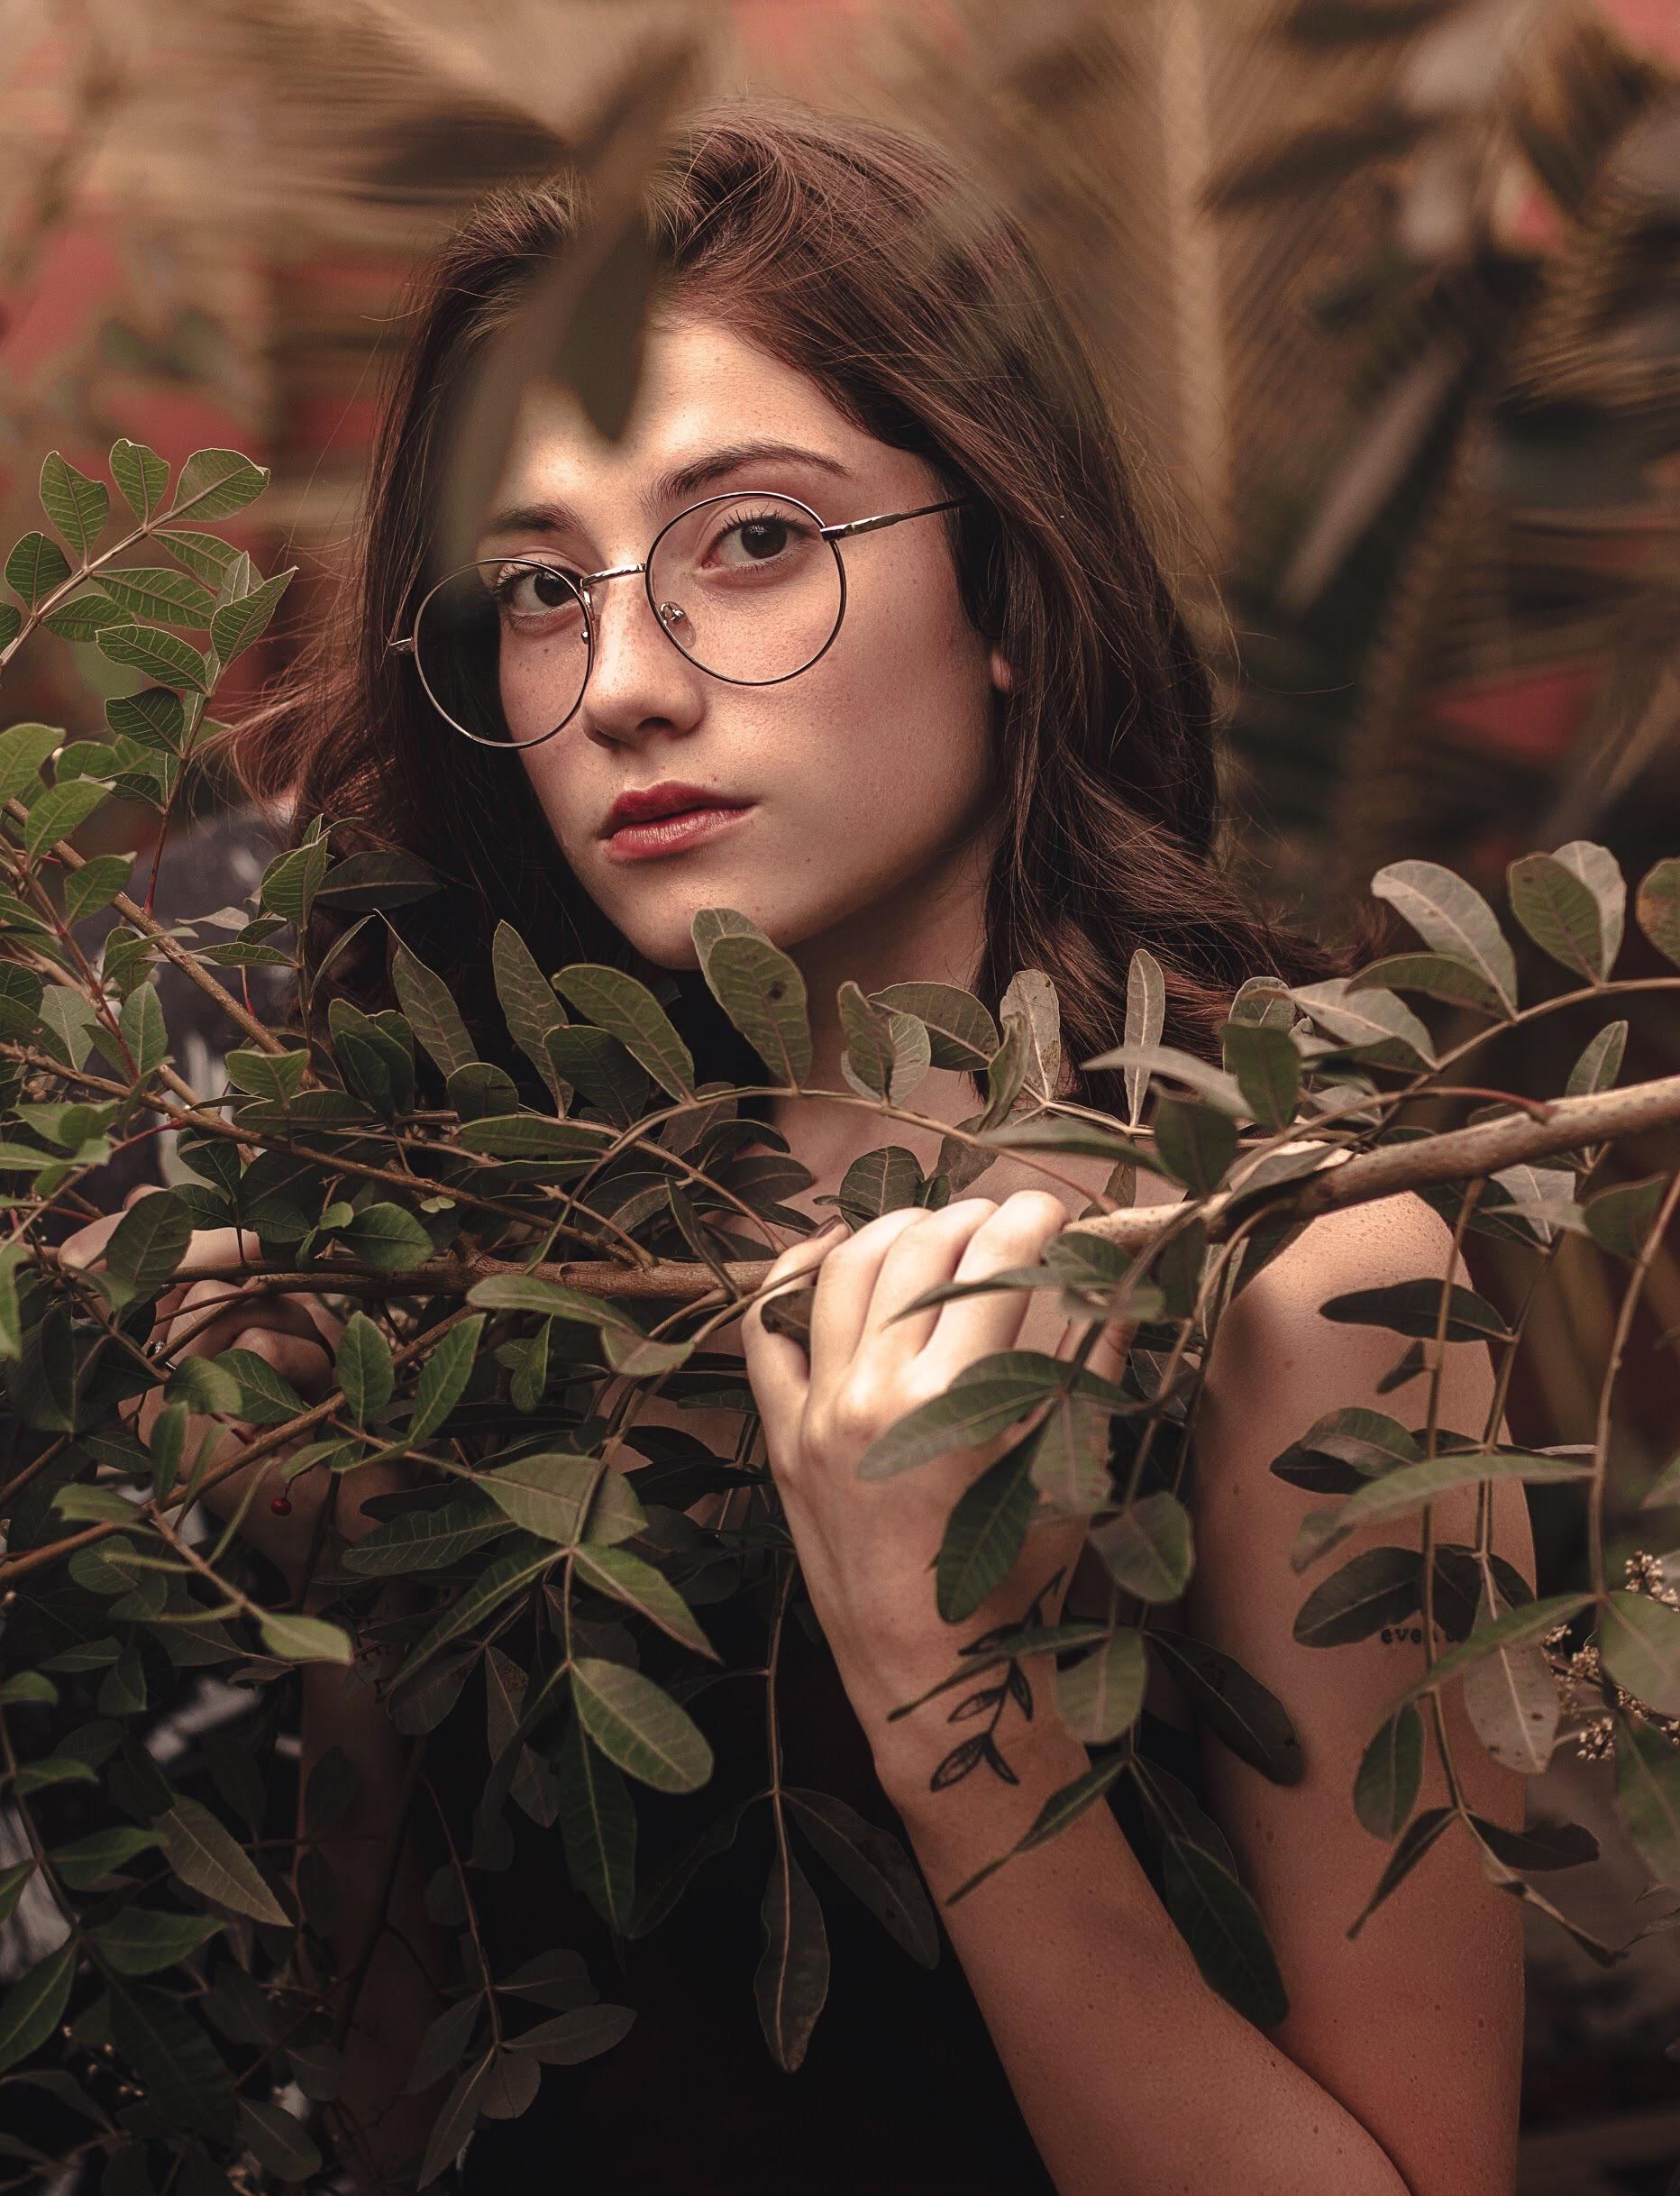 Woman Wearing Gray Eyeglasses Holding Tree